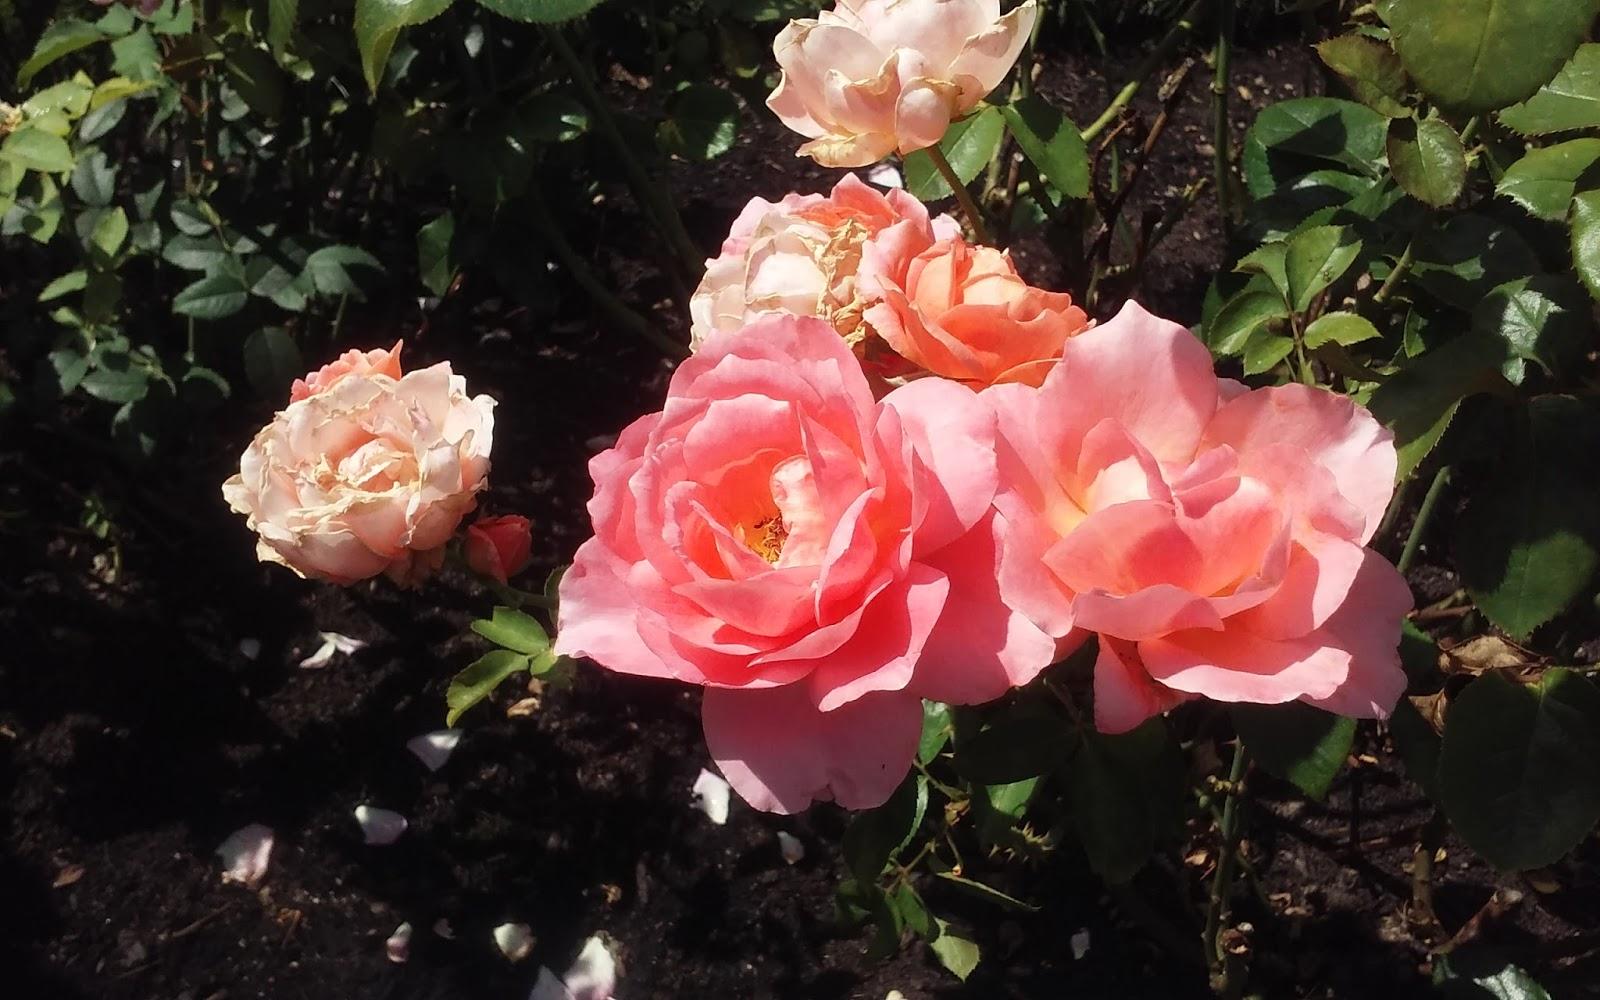 Poetic Popcorn Poetry A Rose Walk # Sunshower Rose_173655